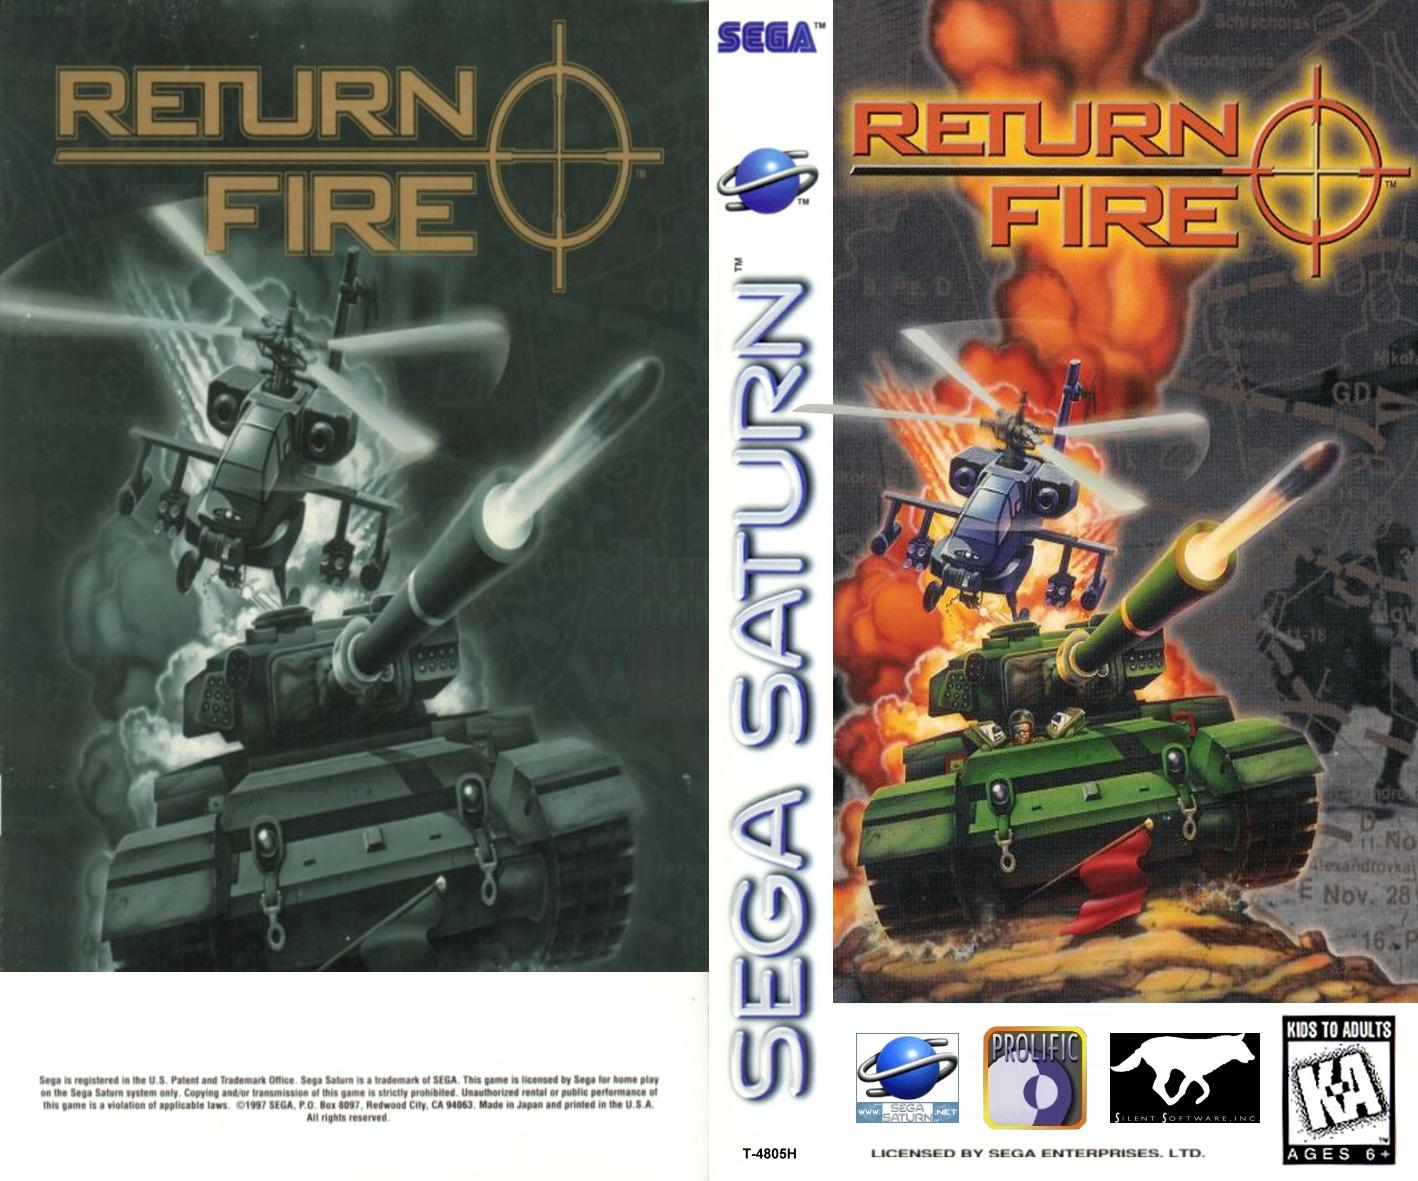 GameTronik - Return%20Fire%20%28Unreleased%20complete%20game%29%20